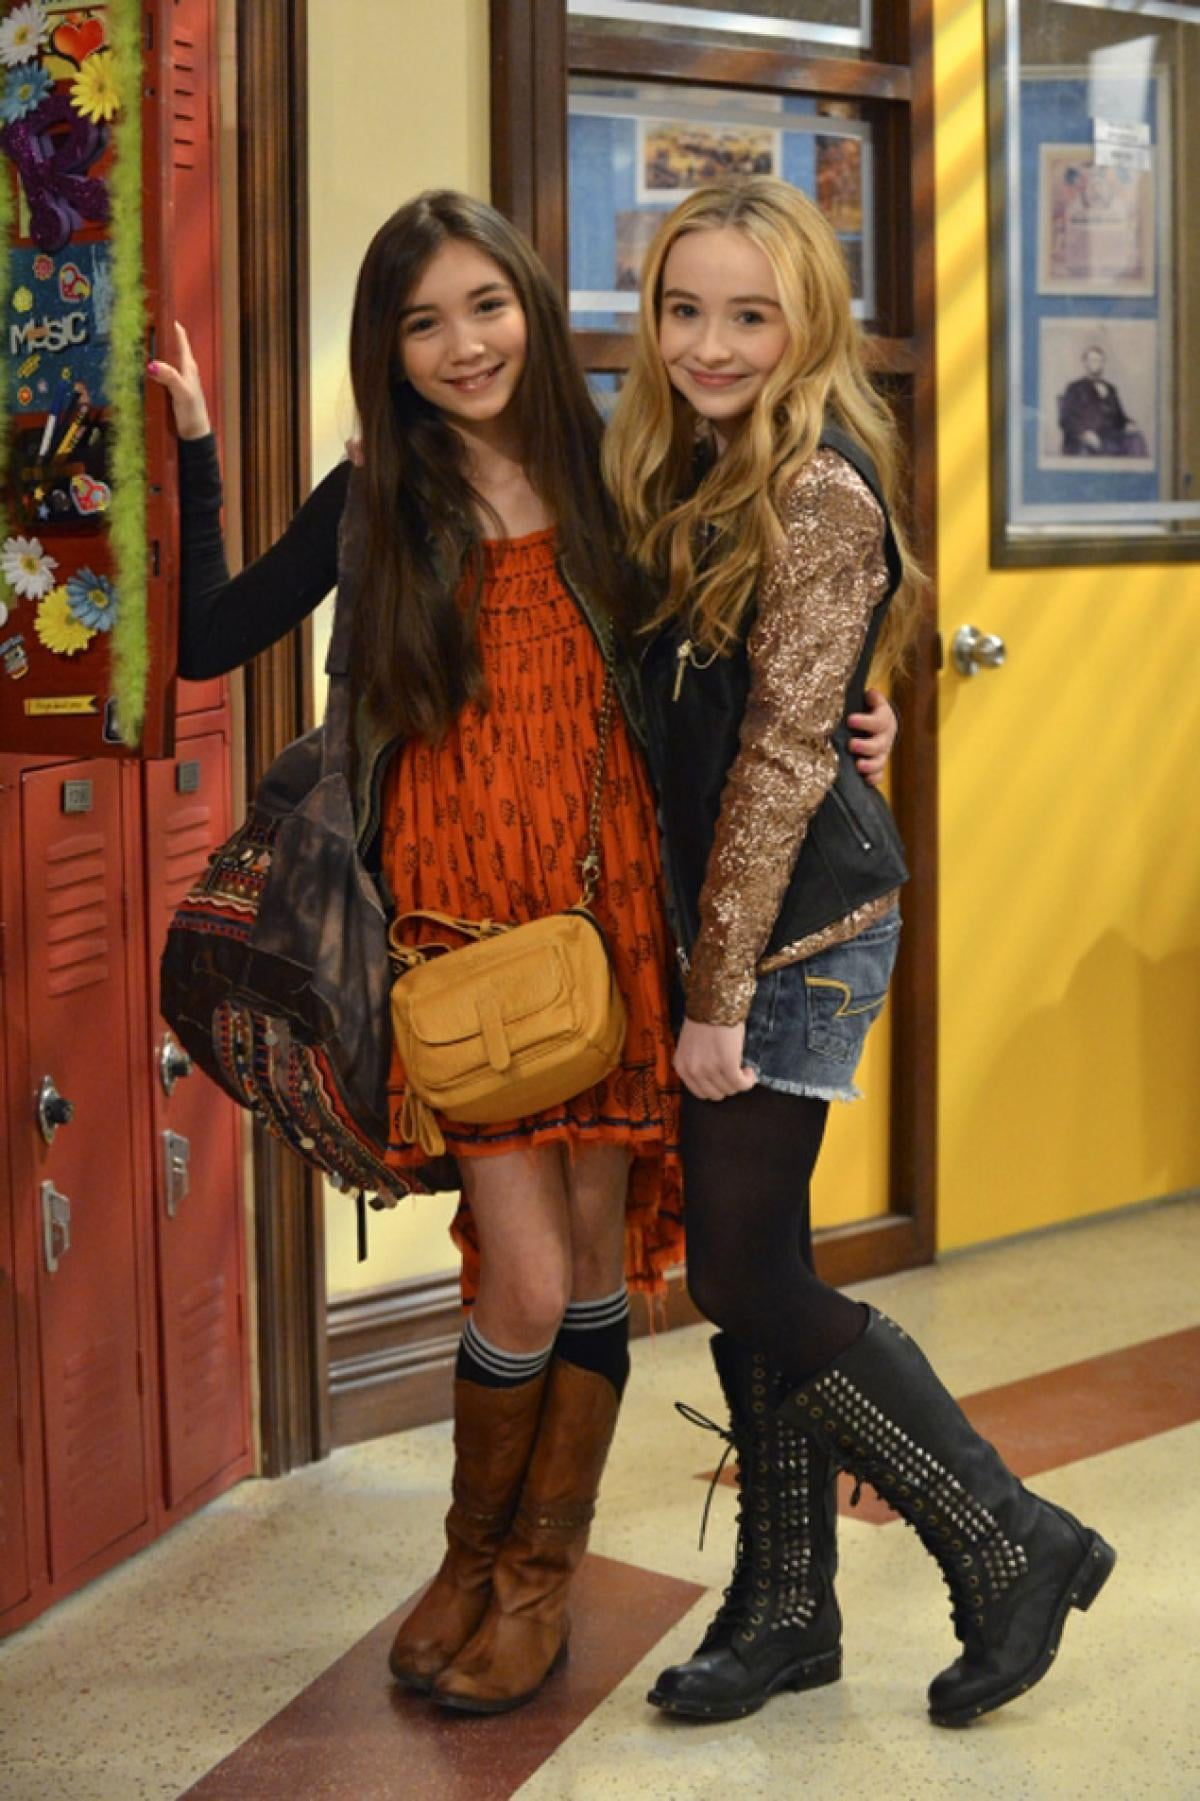 Rowan Blanchard and Sabrina Carpenter as Riley Matthews (Cory and Topanga's daughter!) and her best friend, Maya Hart.